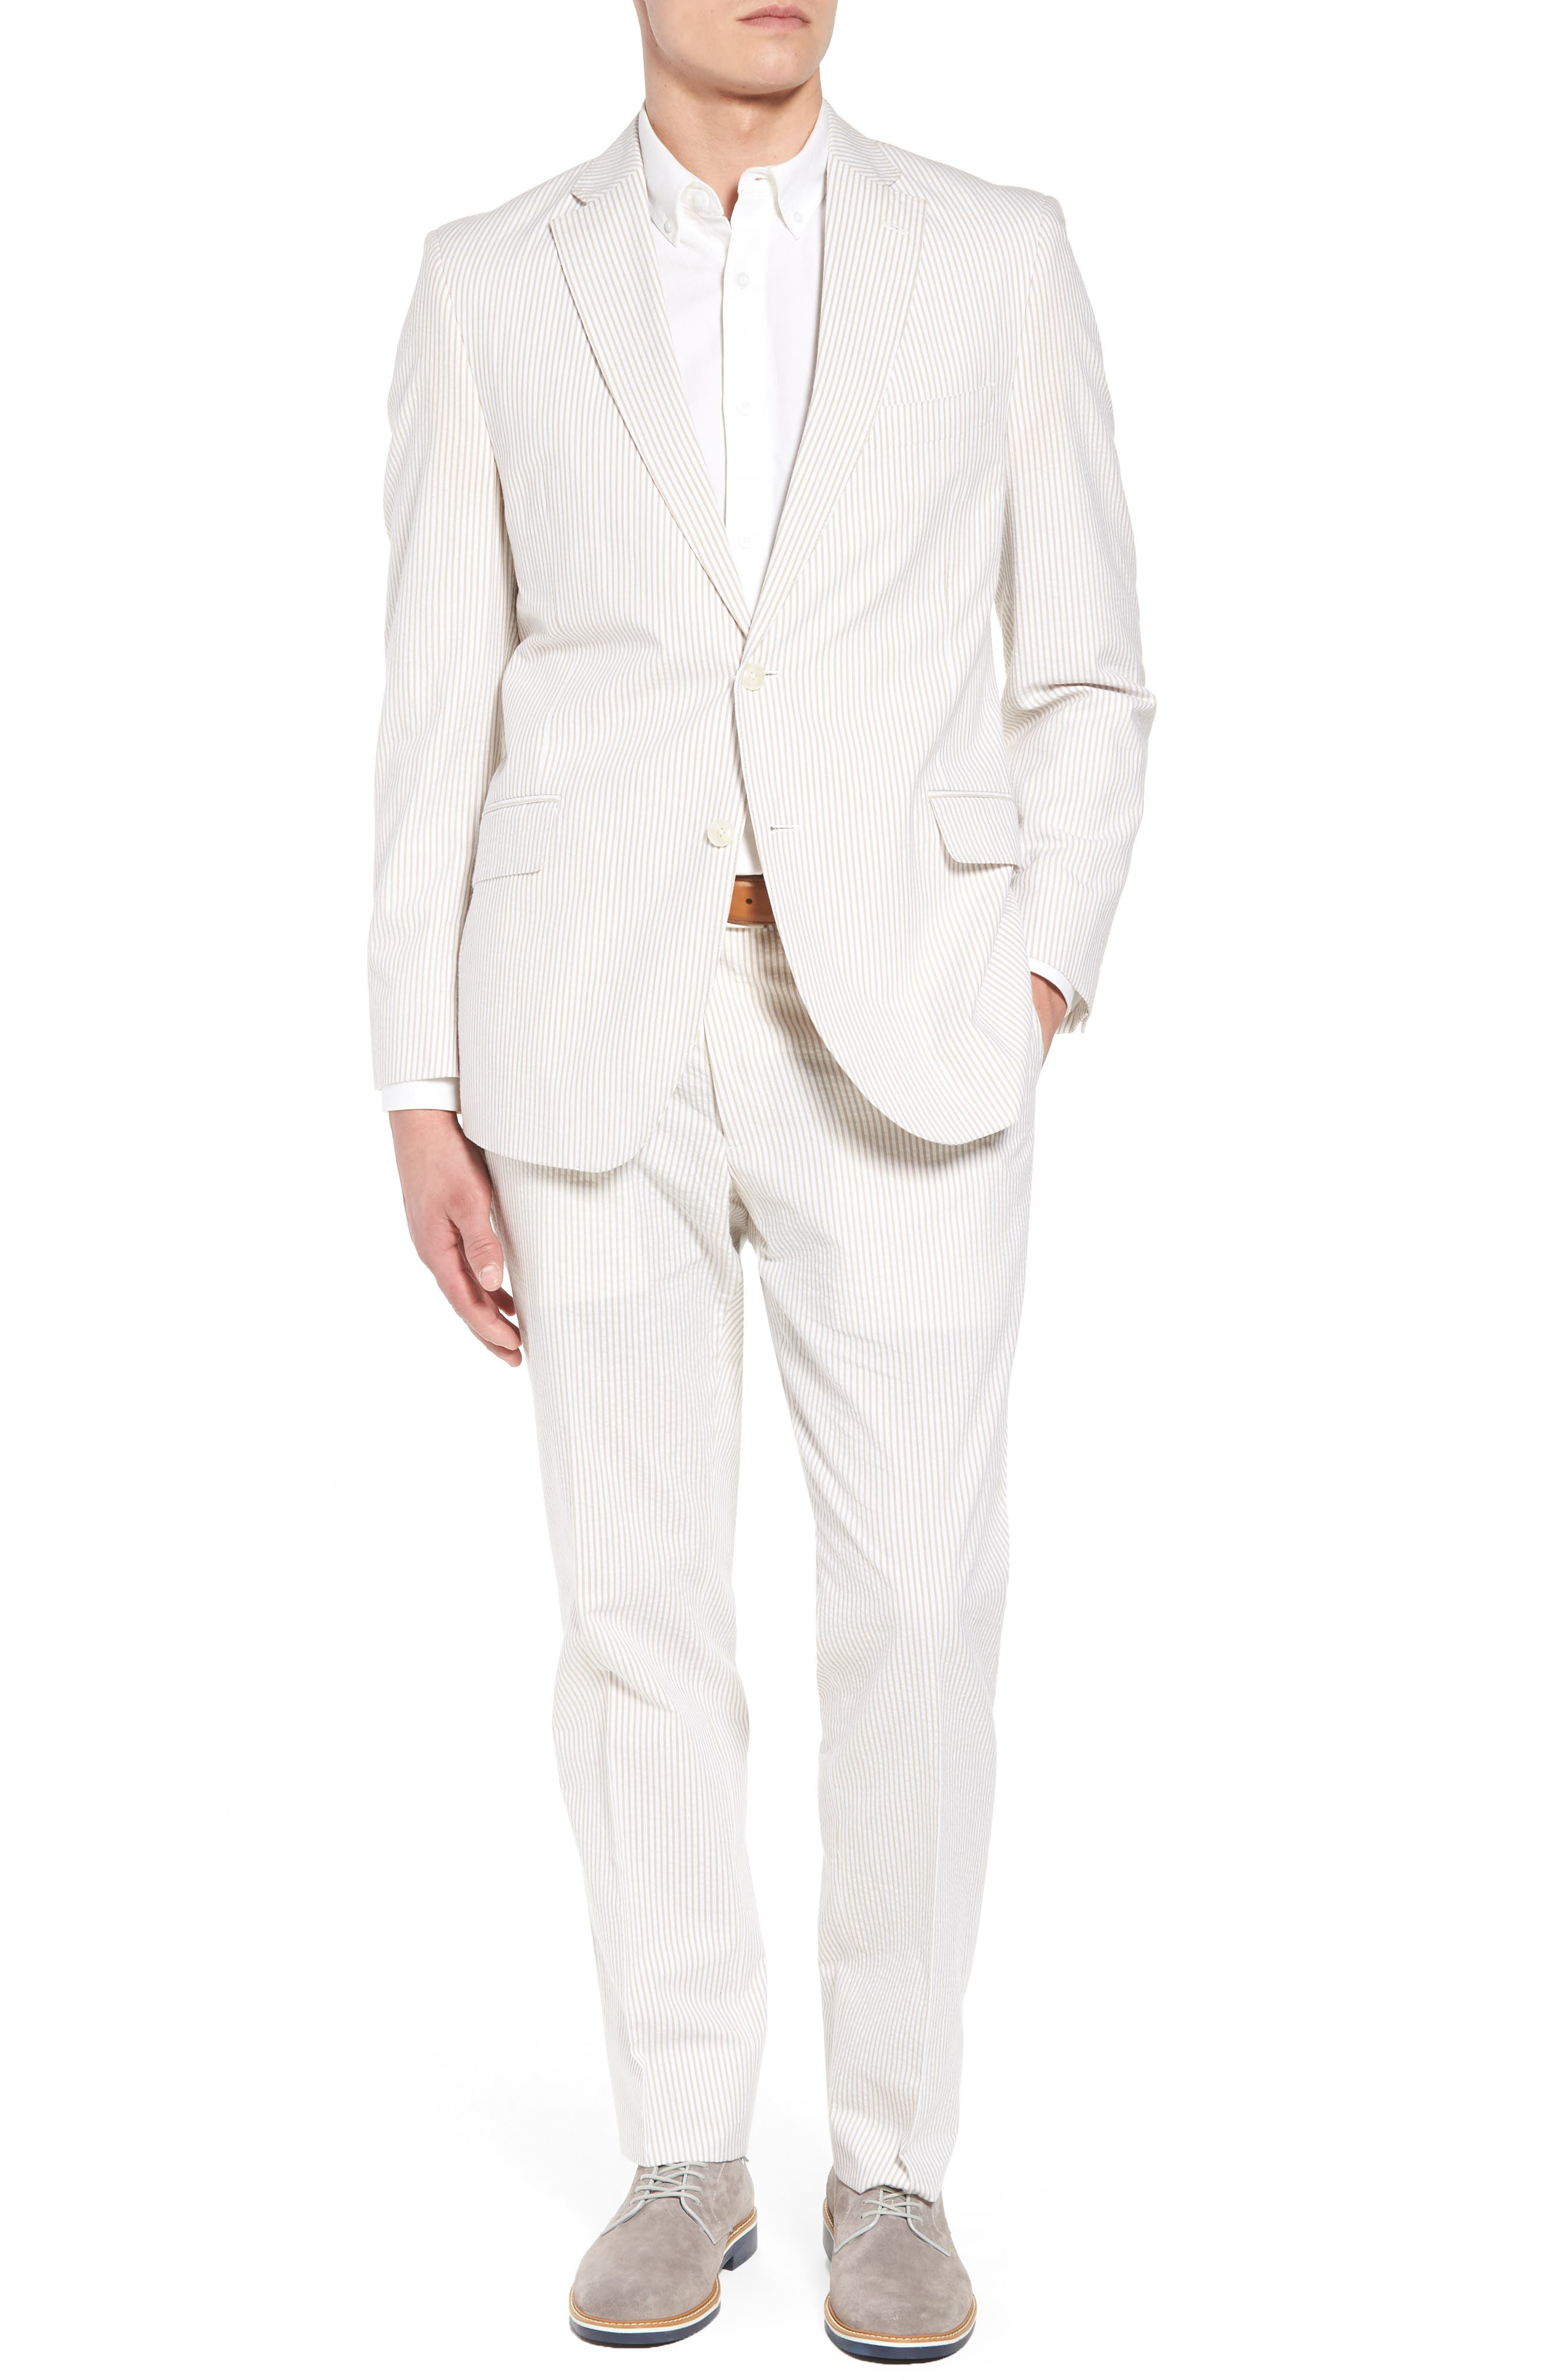 Jack AIM Classic Fit Seersucker Sport Coat,                             Alternate thumbnail 7, color,                             Tan And White